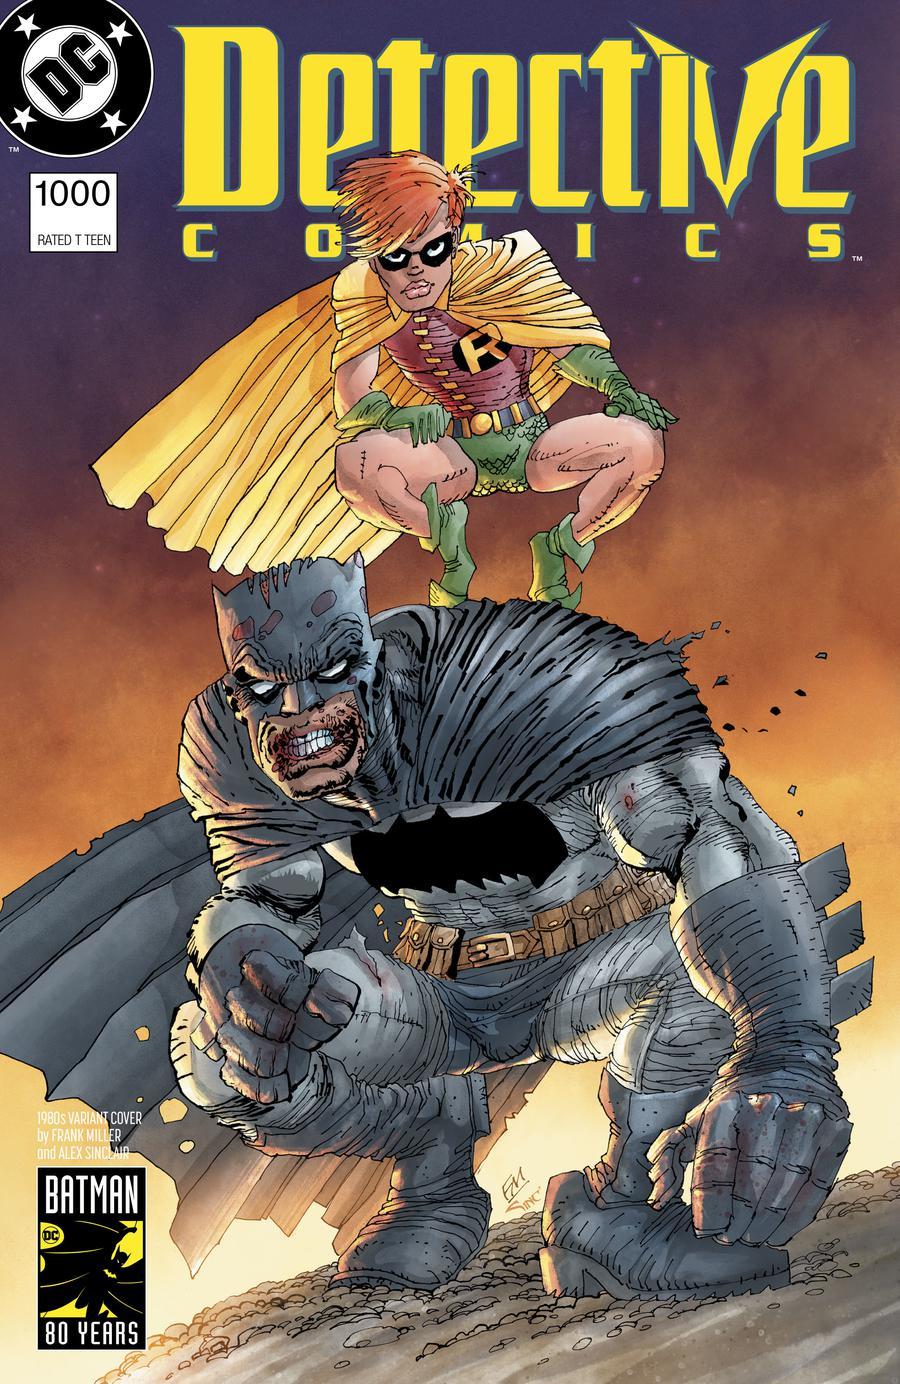 Detective Comics Vol 2 #1000 Cover G Variant Frank Miller 1980s Cover